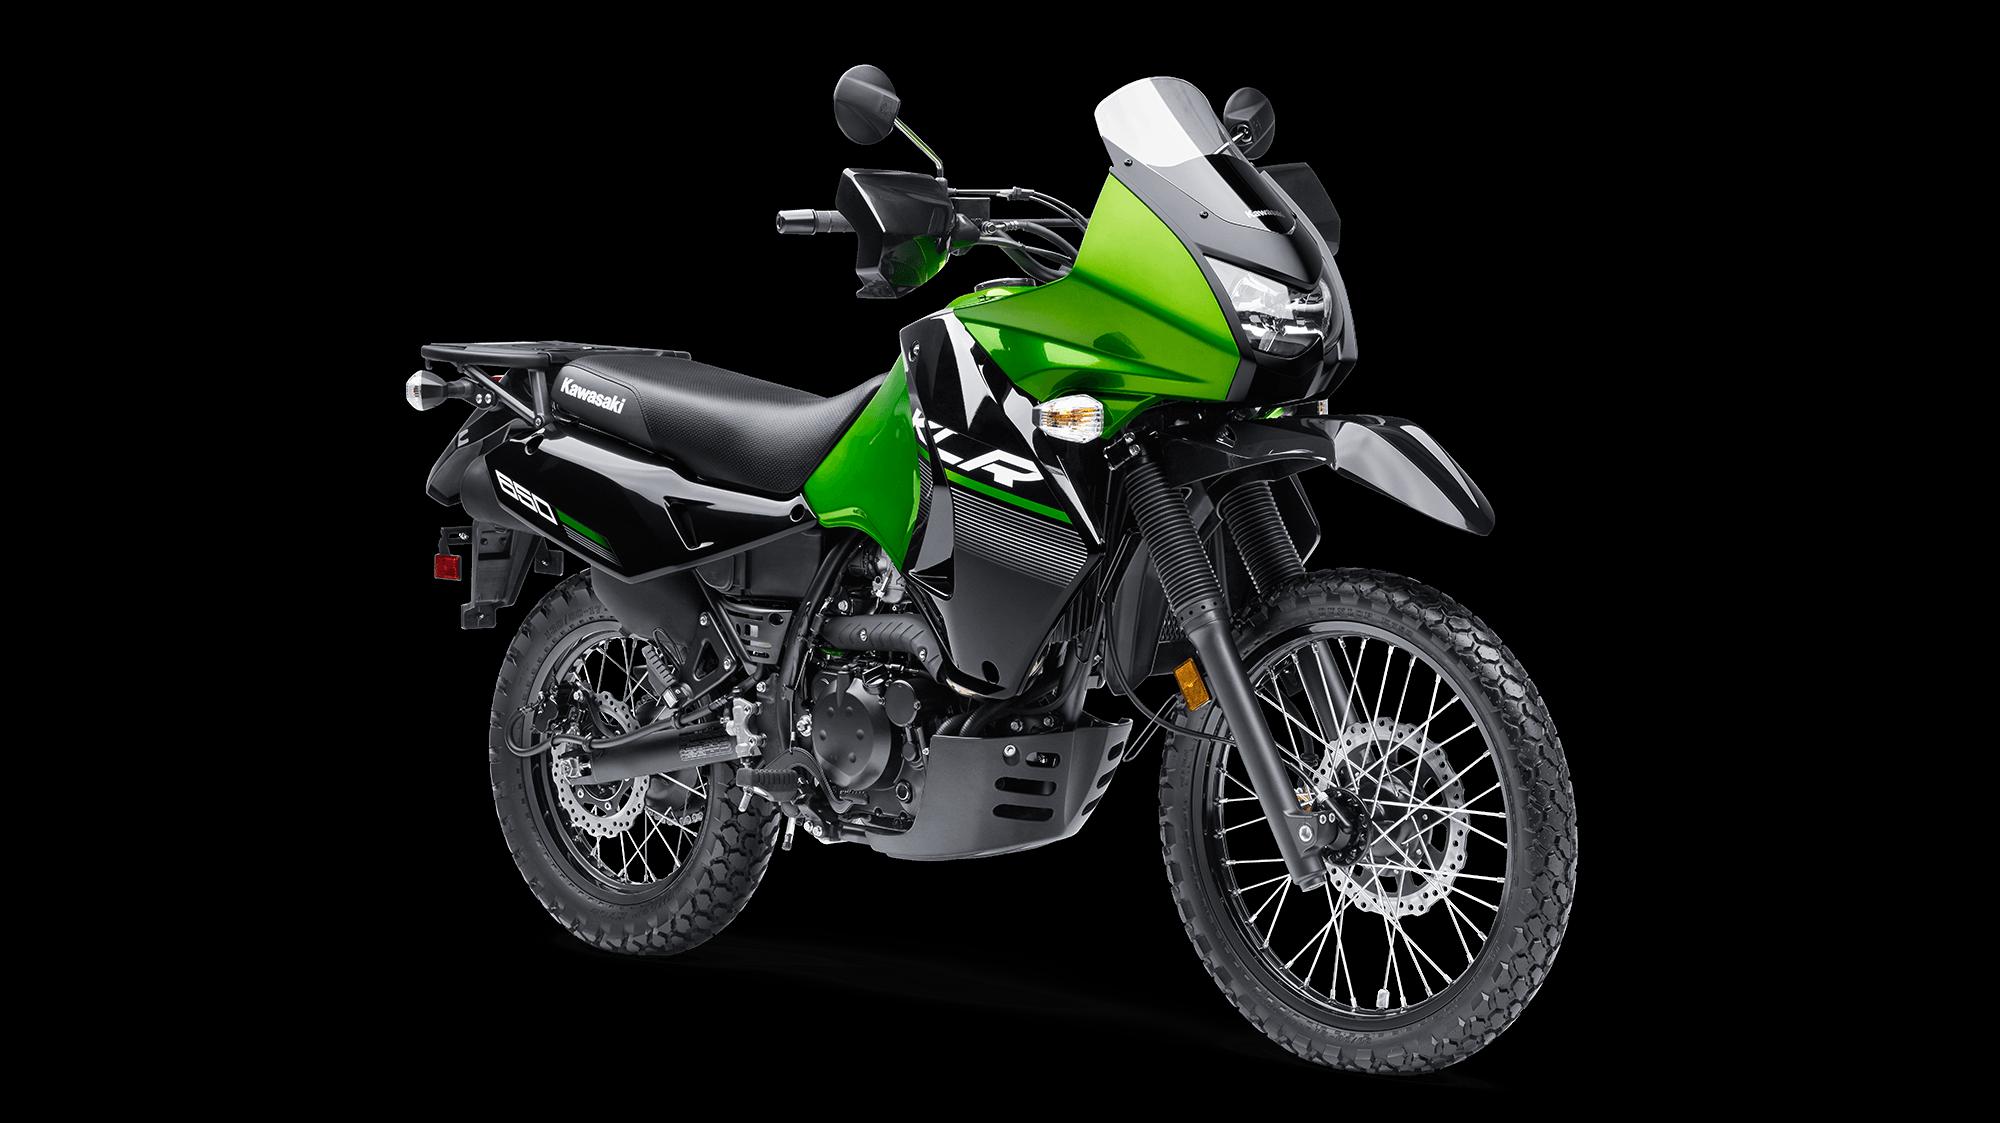 Kawasaki Klr650 Klr500 Motorcycle Service Manual Supplement Quick Reference Guide Klr 650 Motorcycle Adventure Bike